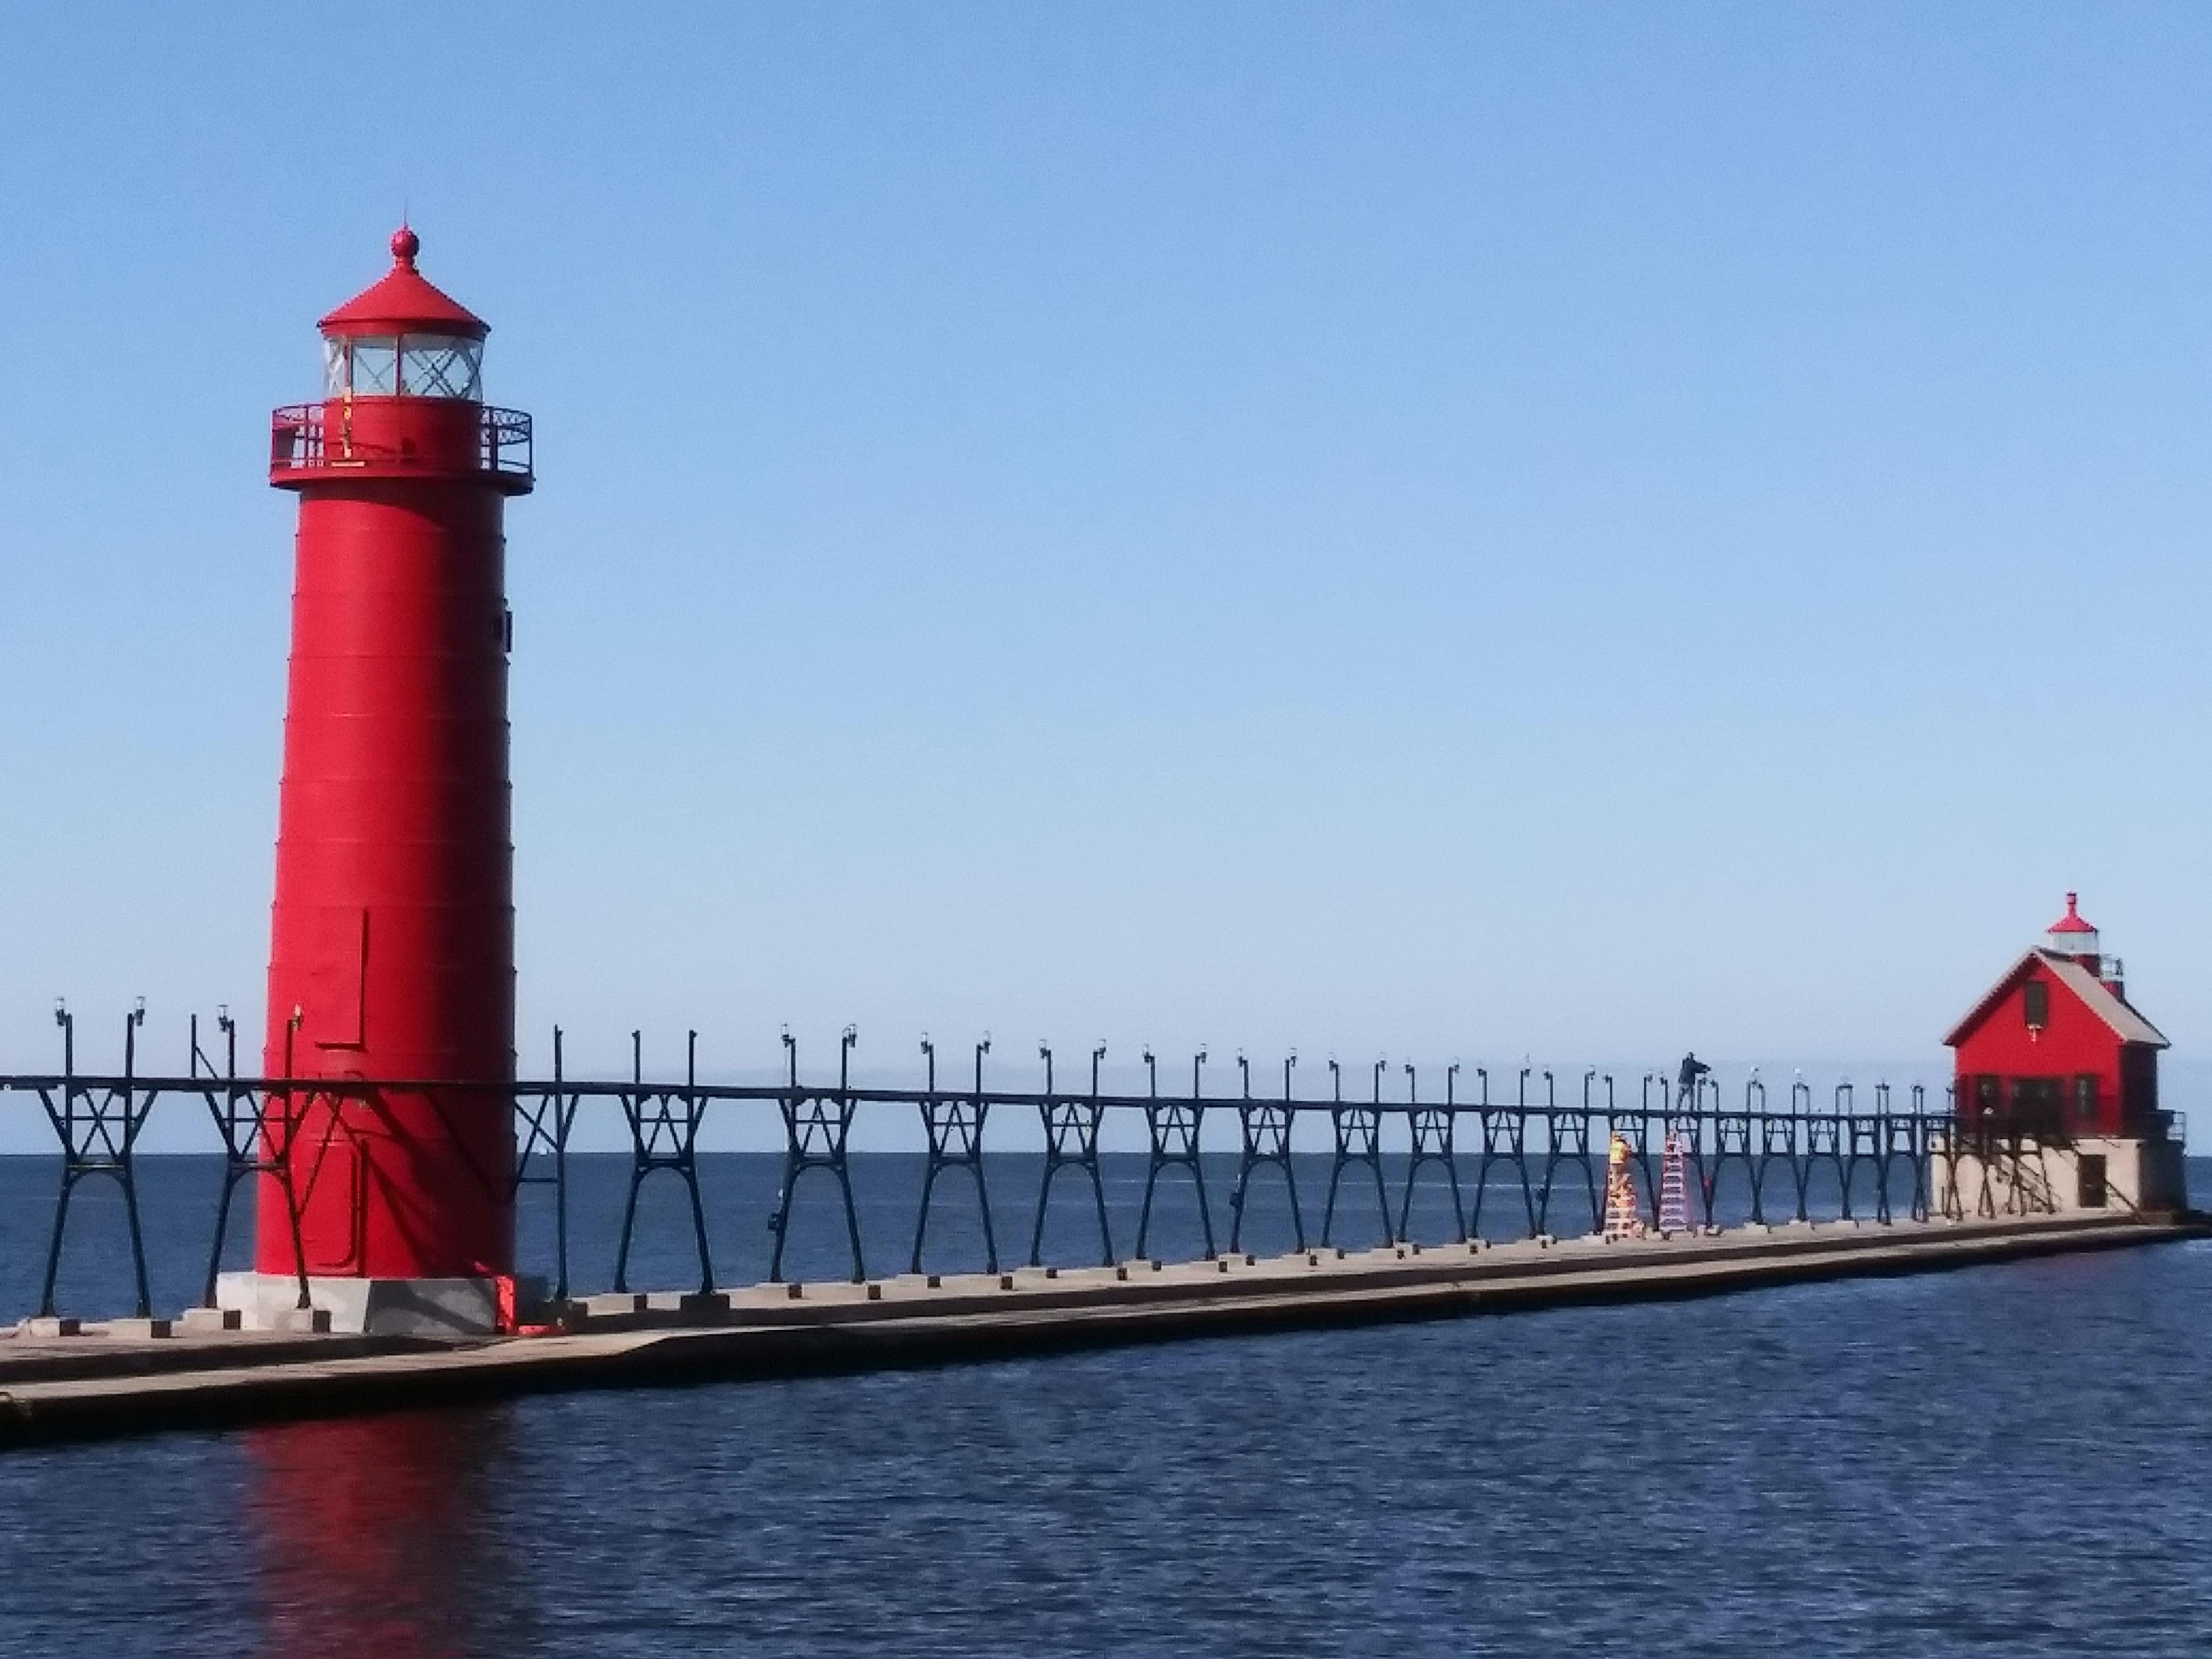 #47 Grand Haven, Michigan to South Haven, Michigan